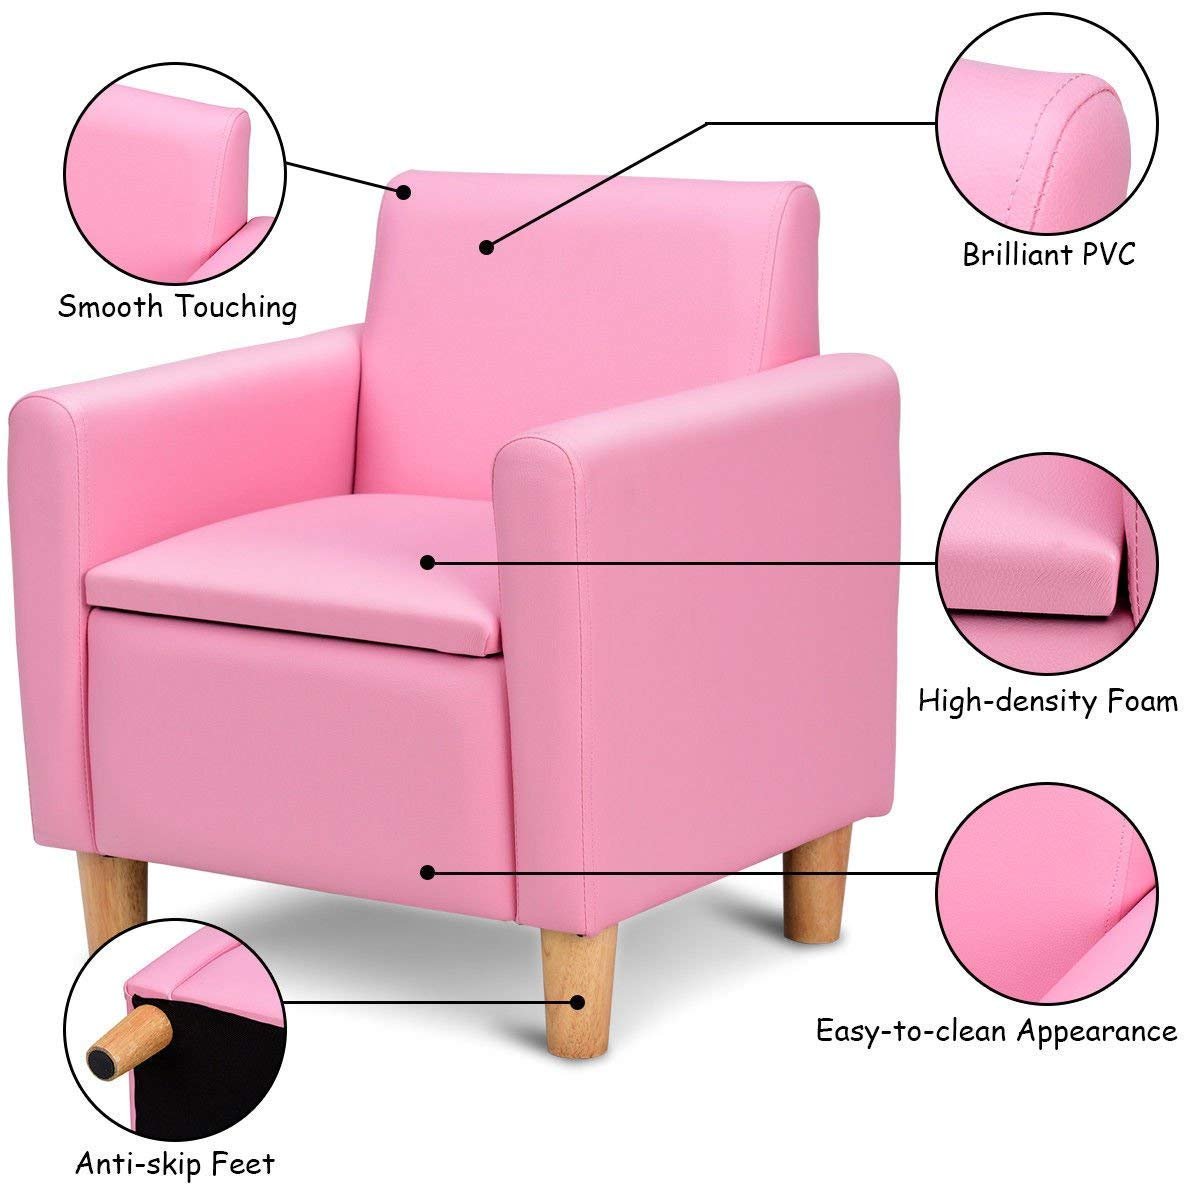 HONEY JOY Kids Sofa, Upholstered Armrest, Sturdy Wood Construction, Toddler Couch with Storage Box (Single Seat, Pink) by HONEY JOY (Image #5)